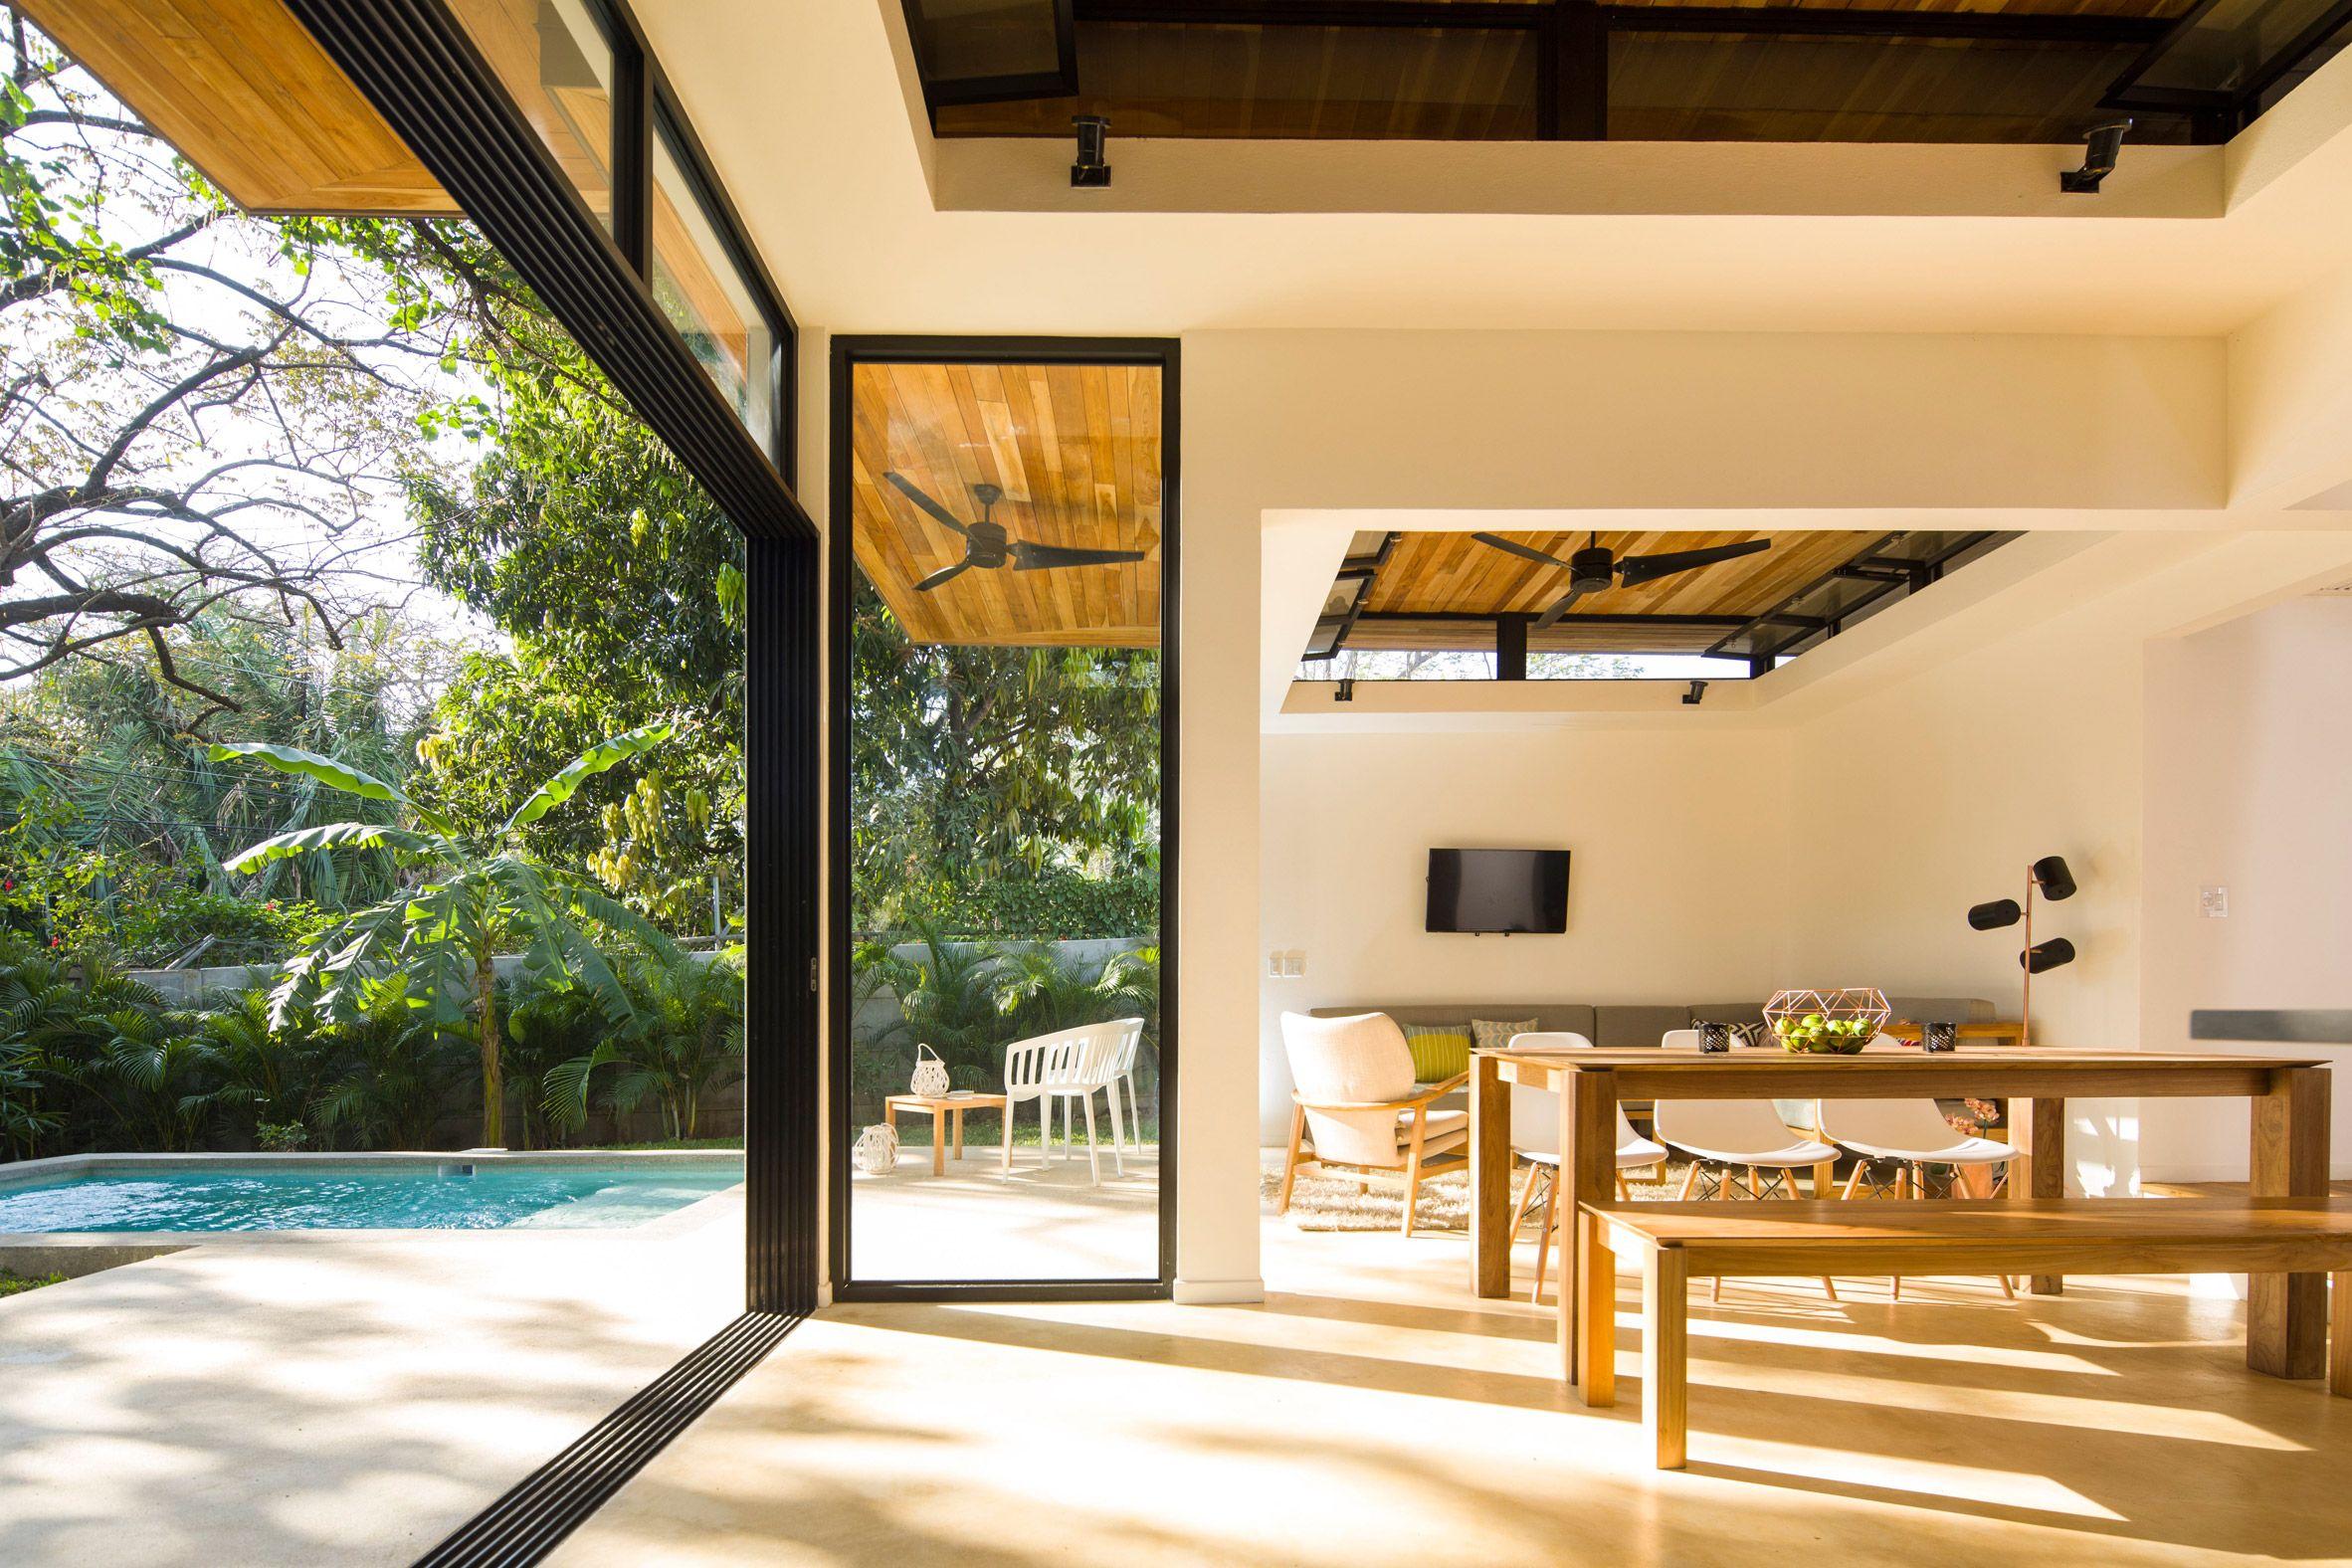 Nalu boutique hotel and yoga studio costa rica by studio saxe